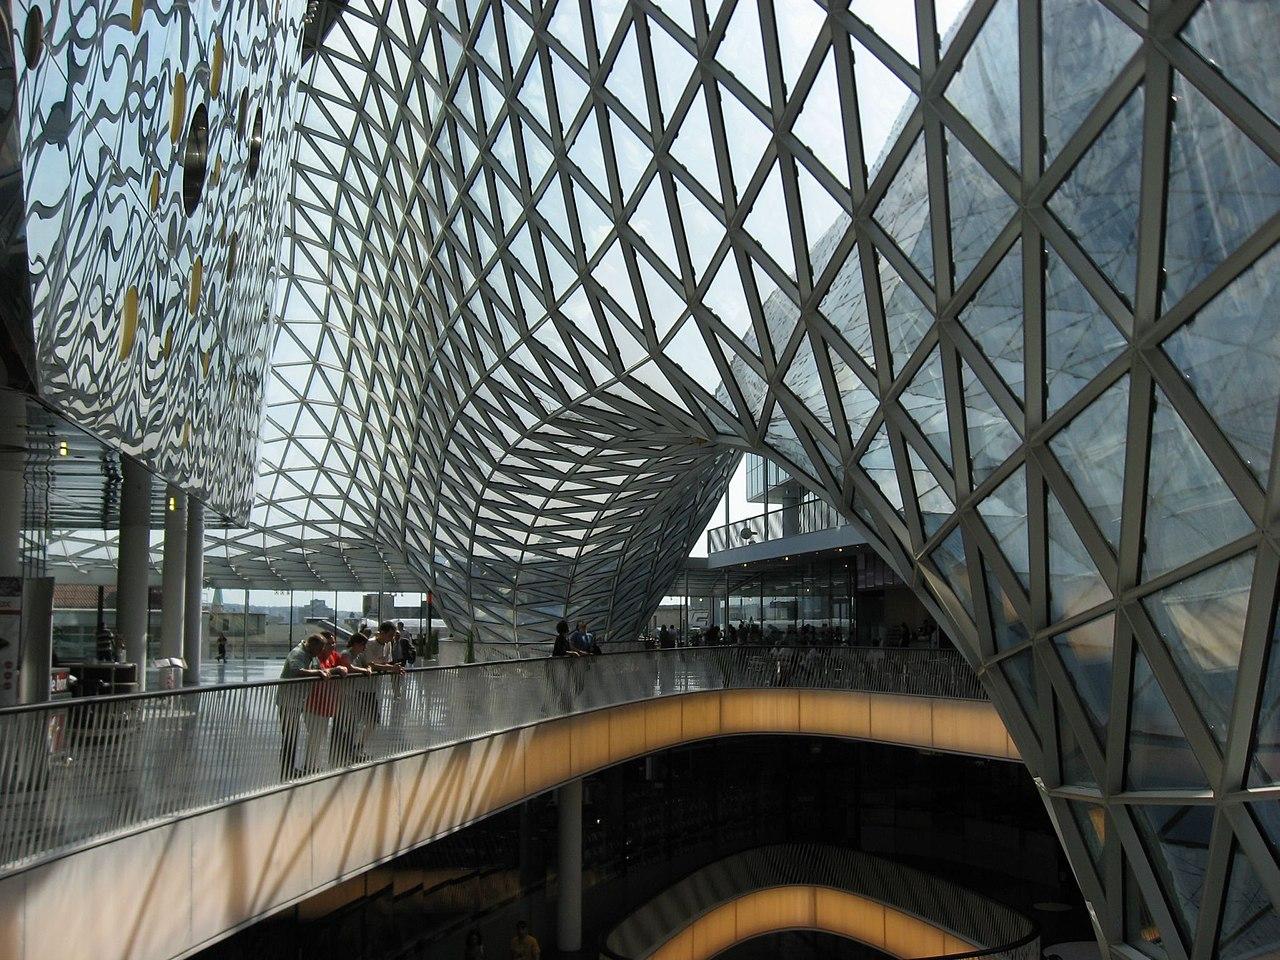 Temporary Glass Dome Restaurant In London Bridge